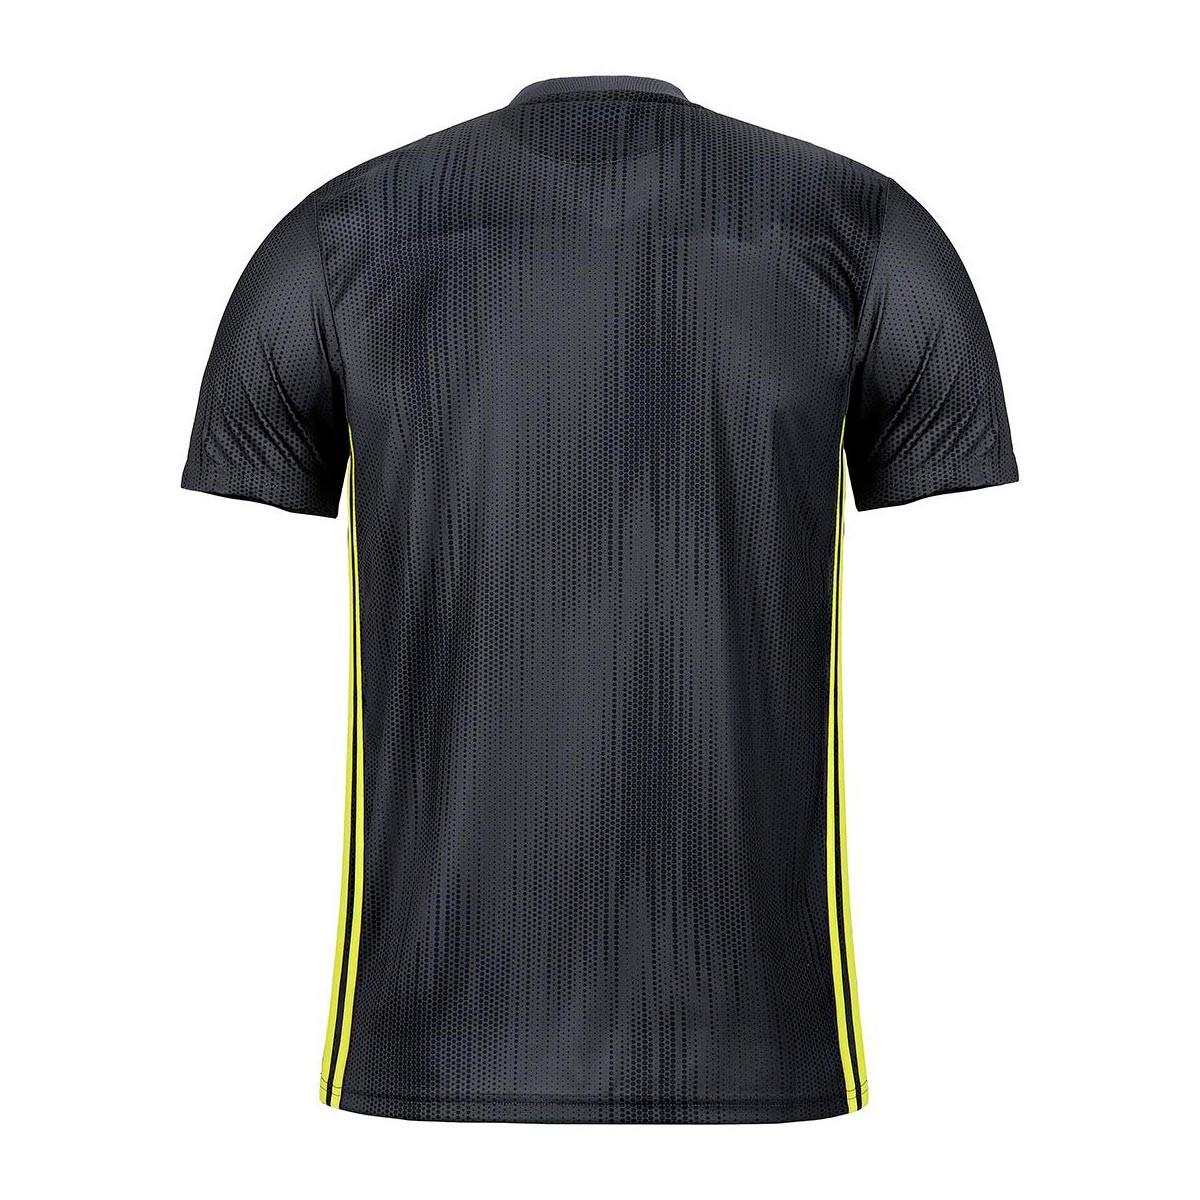 Jersey adidas Juventus 2018-2019 Third Carbon-Shock yellow ... 1c3afd050bf5a